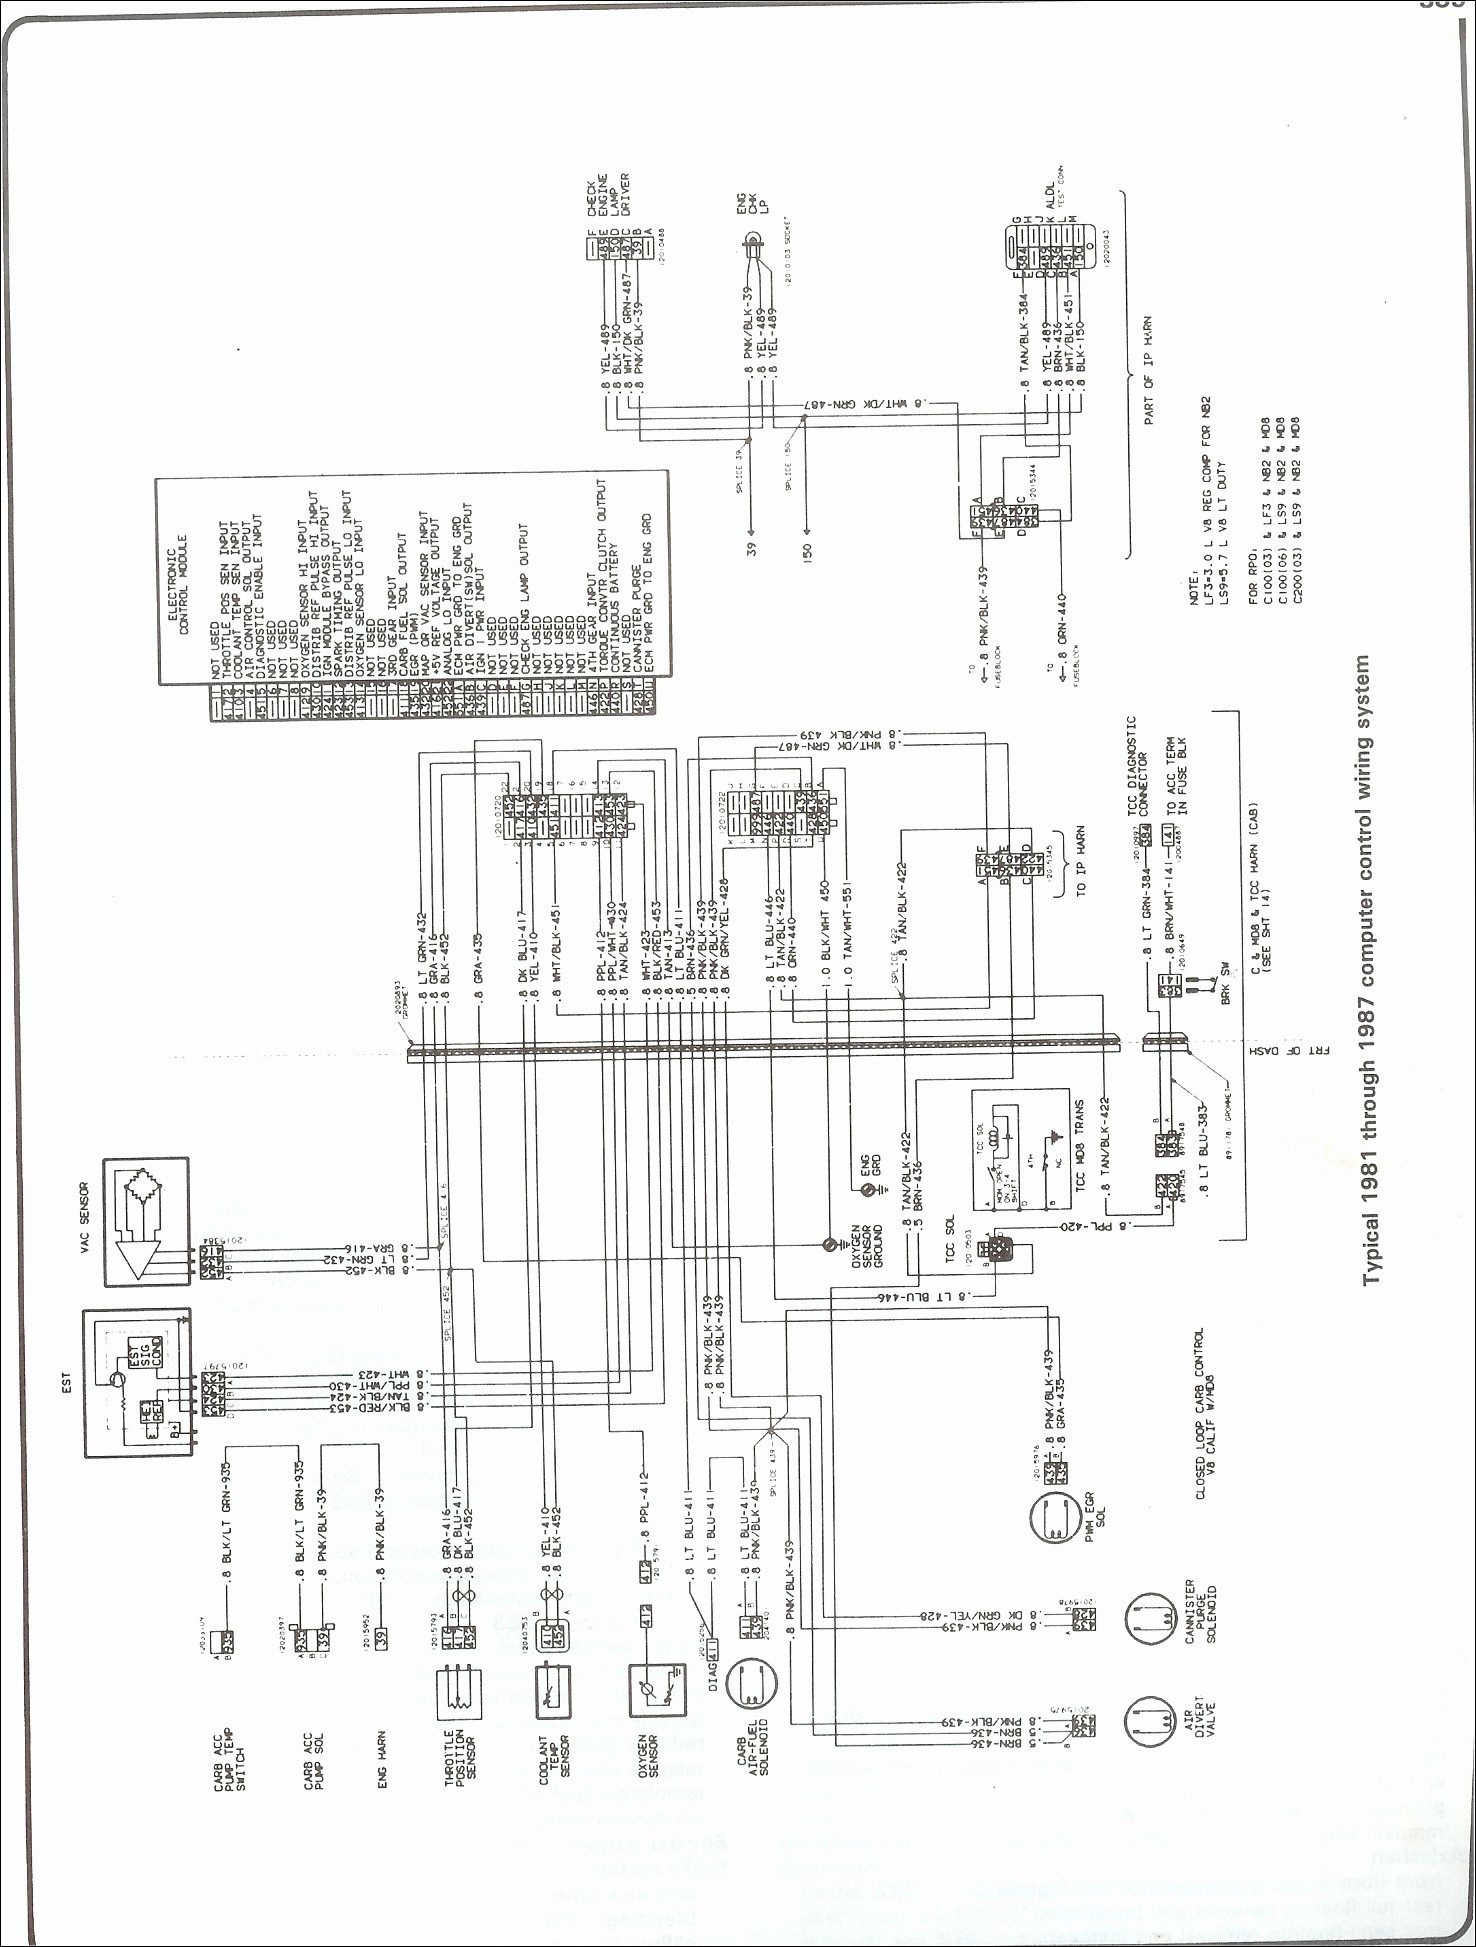 1985 Chevy Truck Wiring Diagram 86 Chevy Truck Wiring Harness Wiring Diagram Datasource Of 1985 Chevy Truck Wiring Diagram